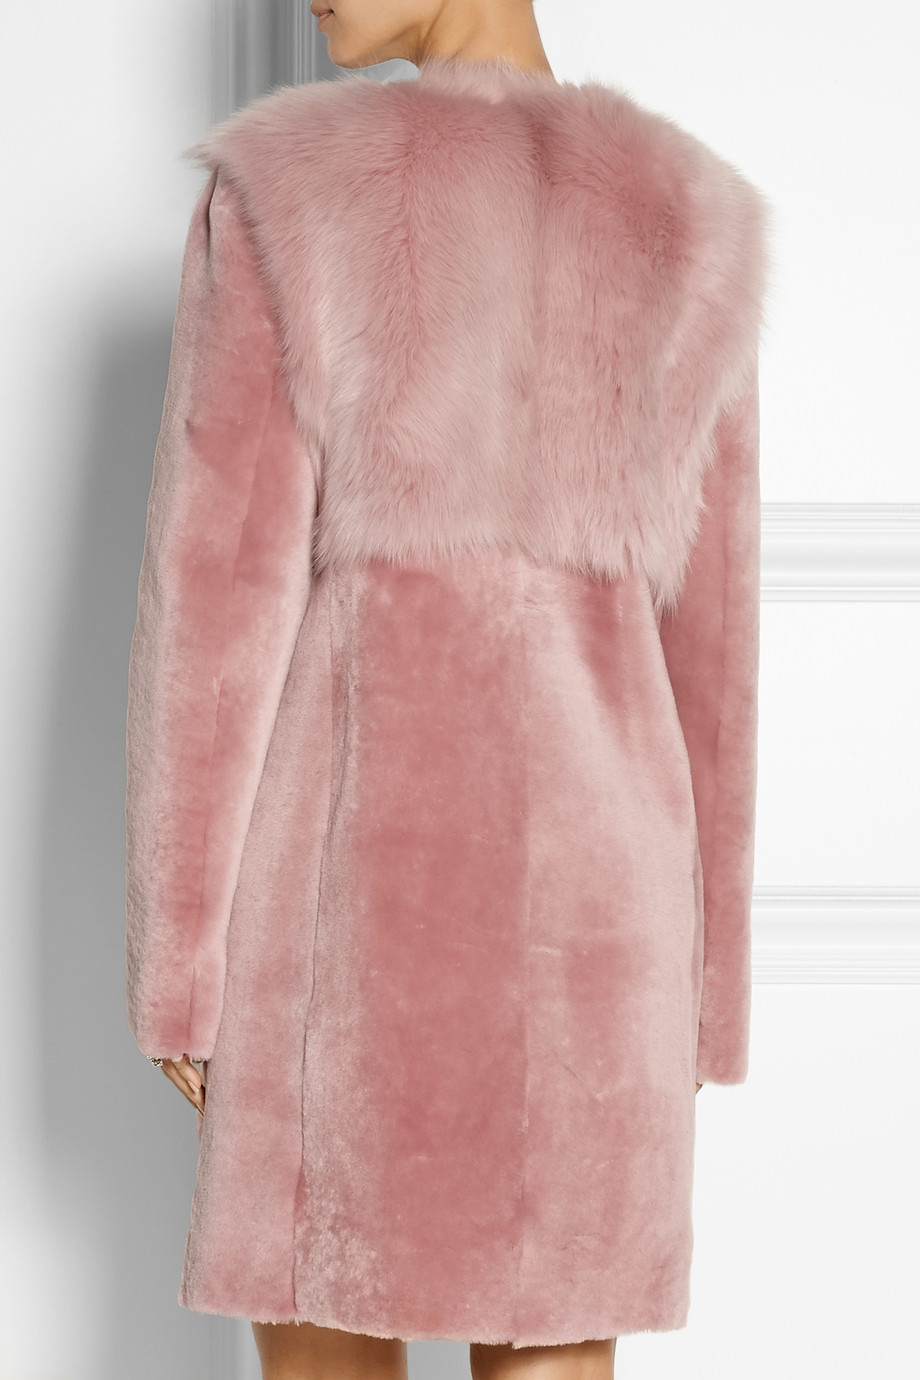 Dkny Shearling Coat in Pink | Lyst